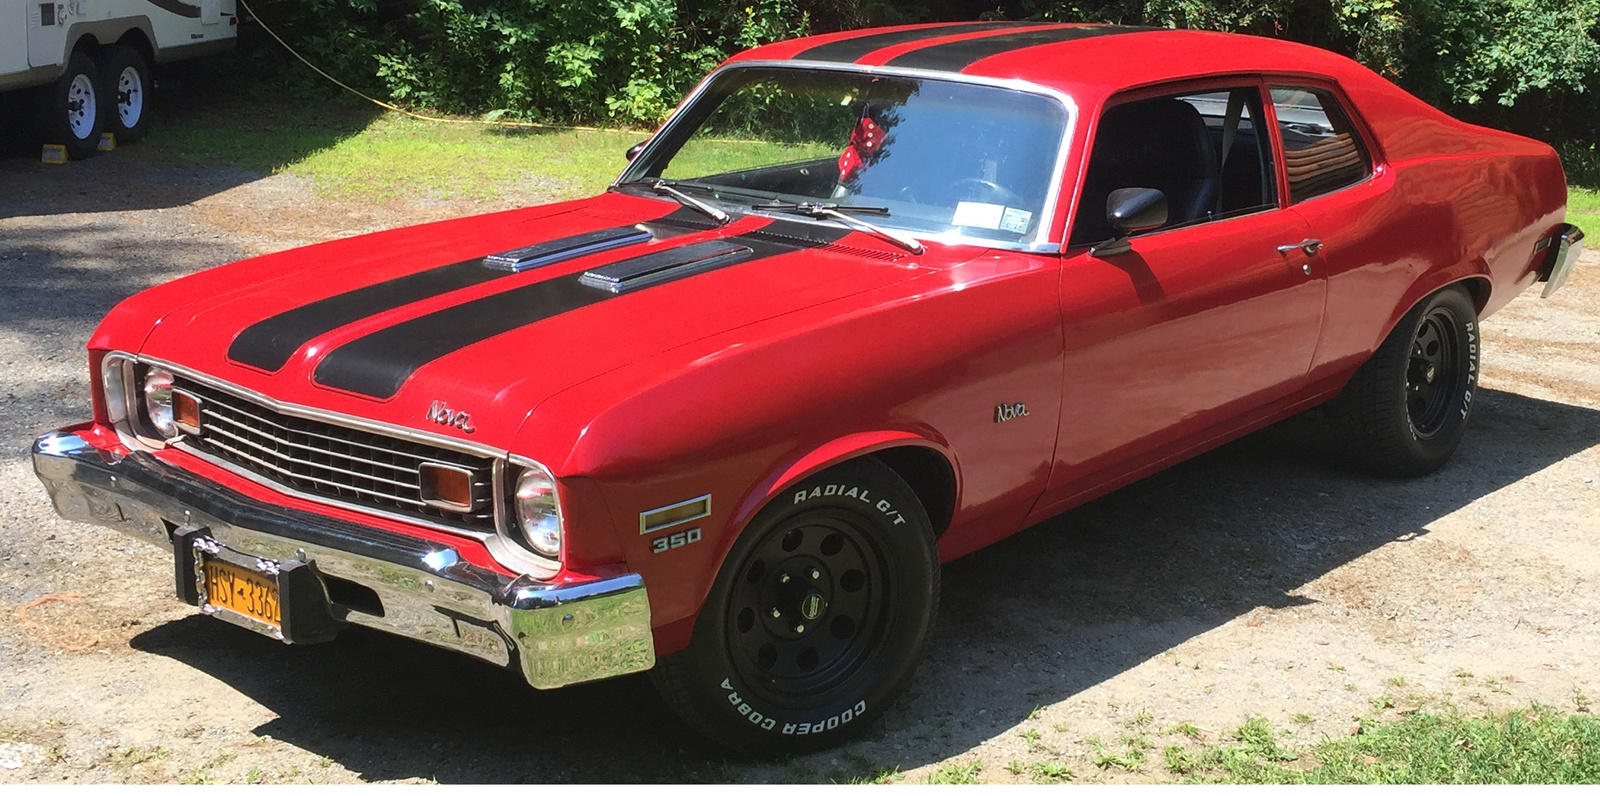 1974 Chevrolet Nova - Overview - CarGurus